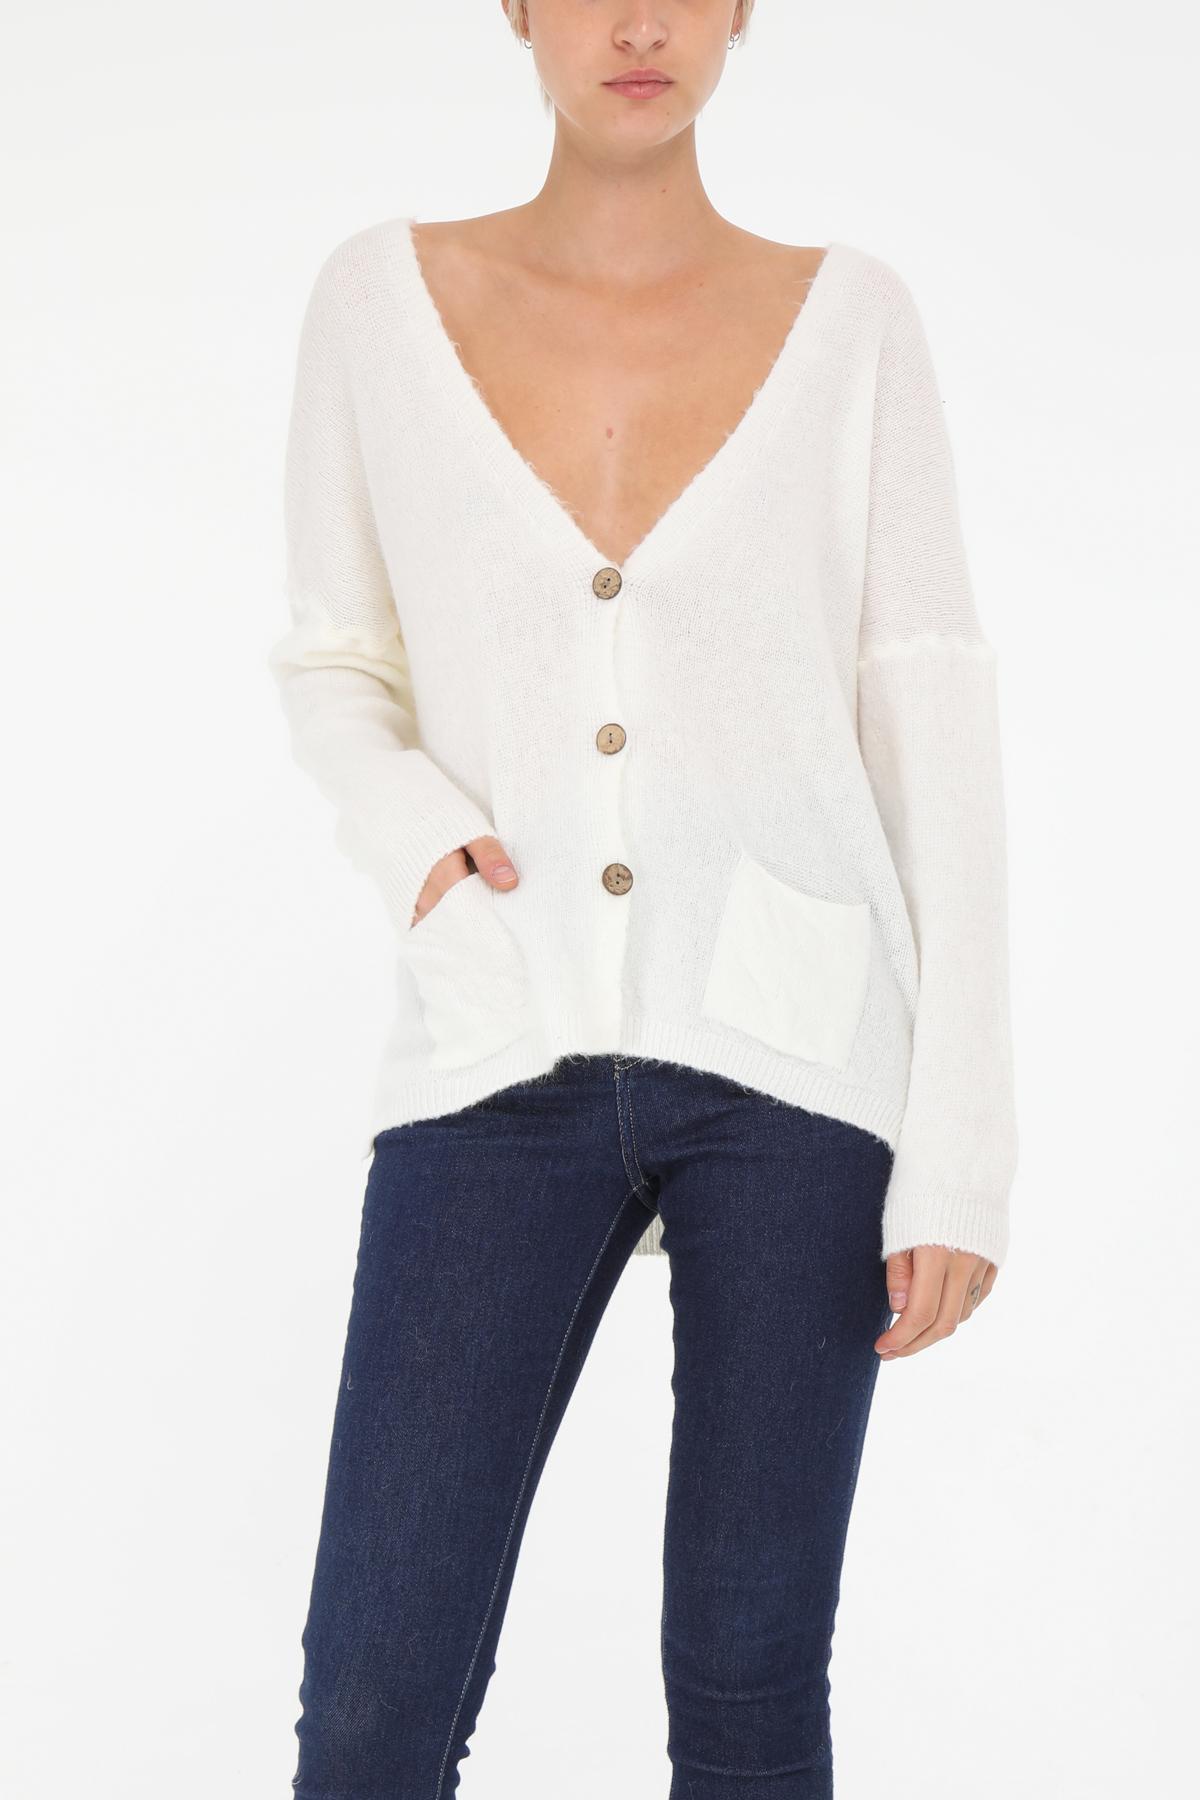 Pulls Femme Blanc YELLOZ E8001 #c eFashion Paris